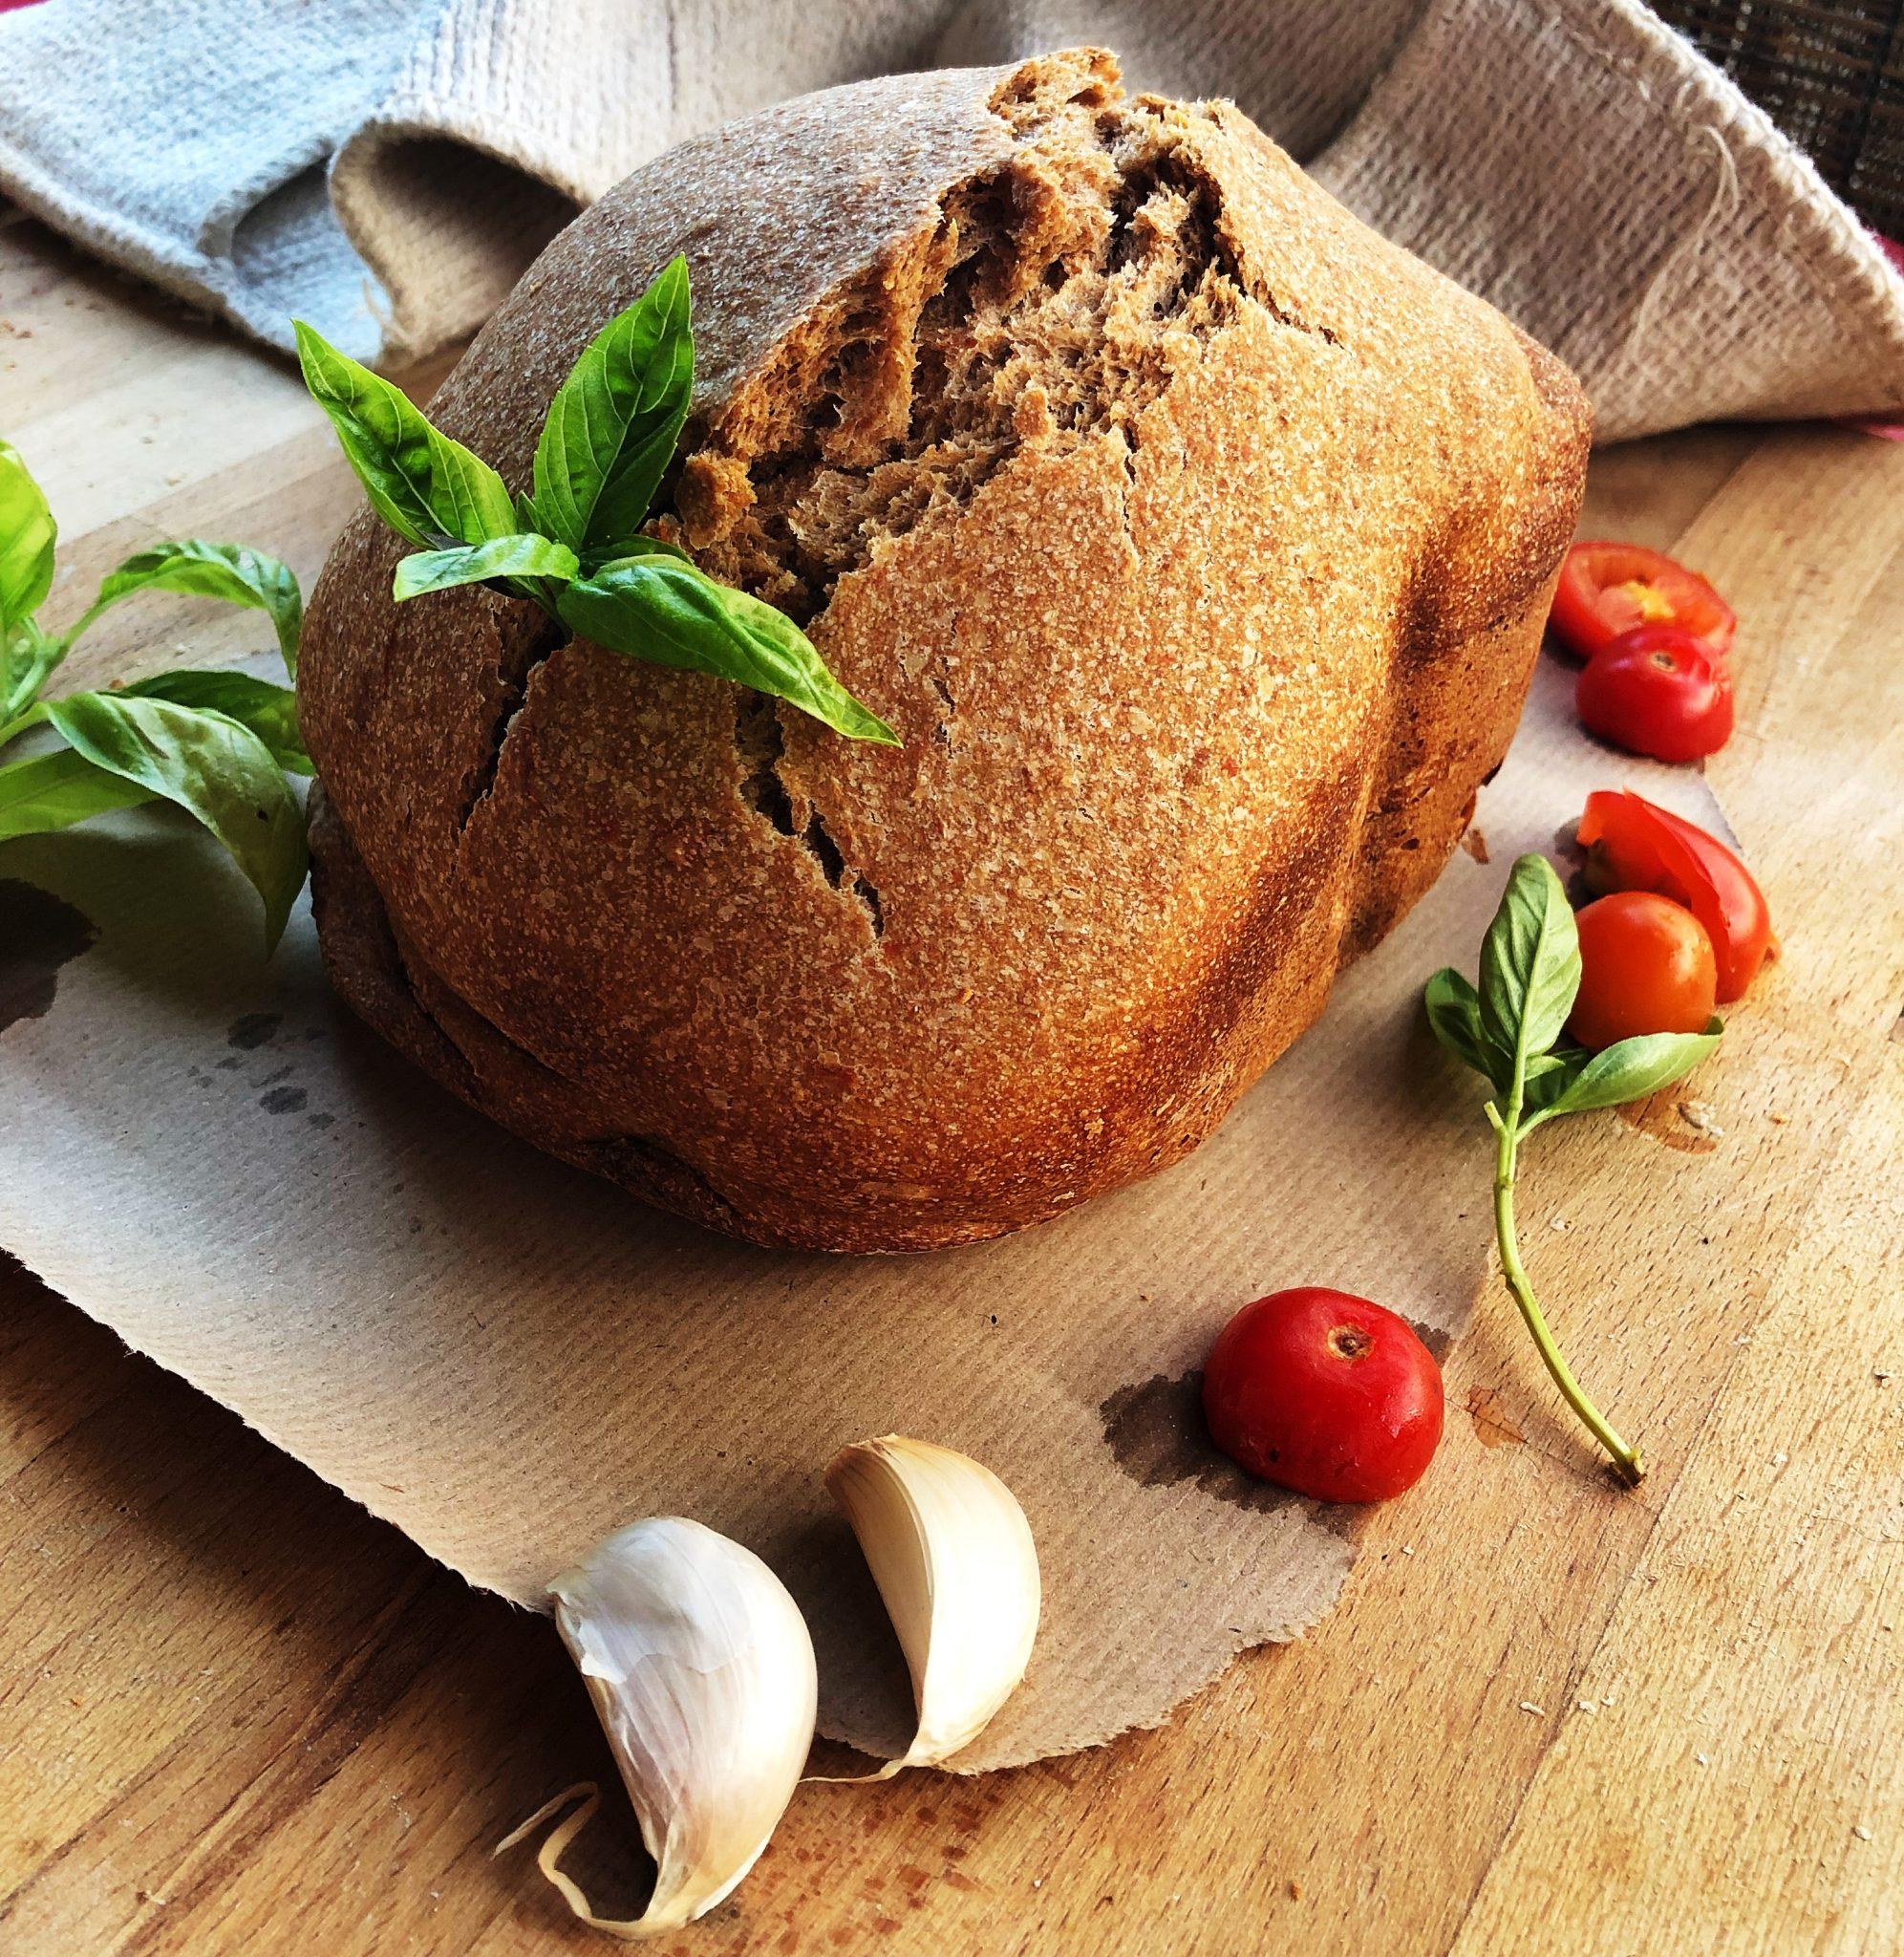 Mindful eating: Pane fatto in casa con pomodorini, basilico e aglio - tatianaberlaffa.com